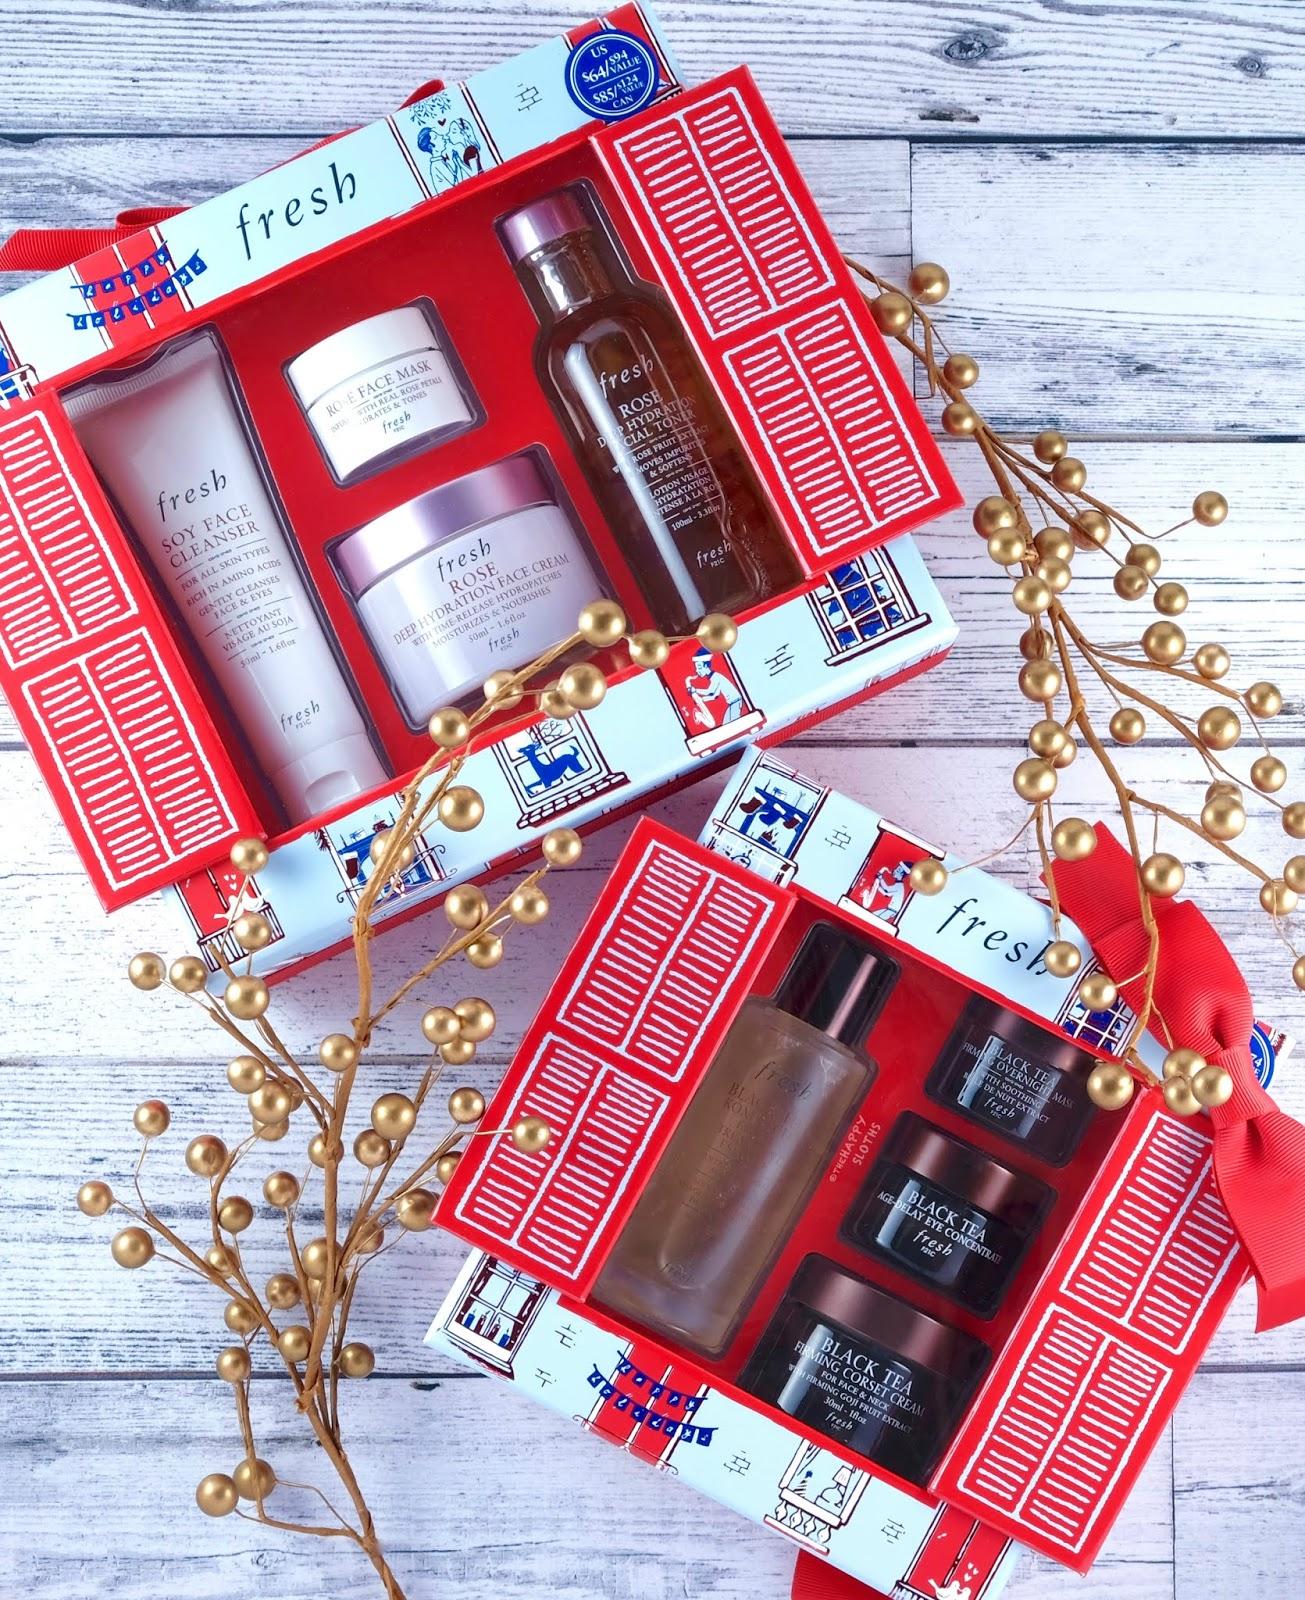 Fresh   Holiday 2019 Hydration Ever After Gift Set & Black Tea Shop Gift Set: Gift Guide + GIVEAWAY